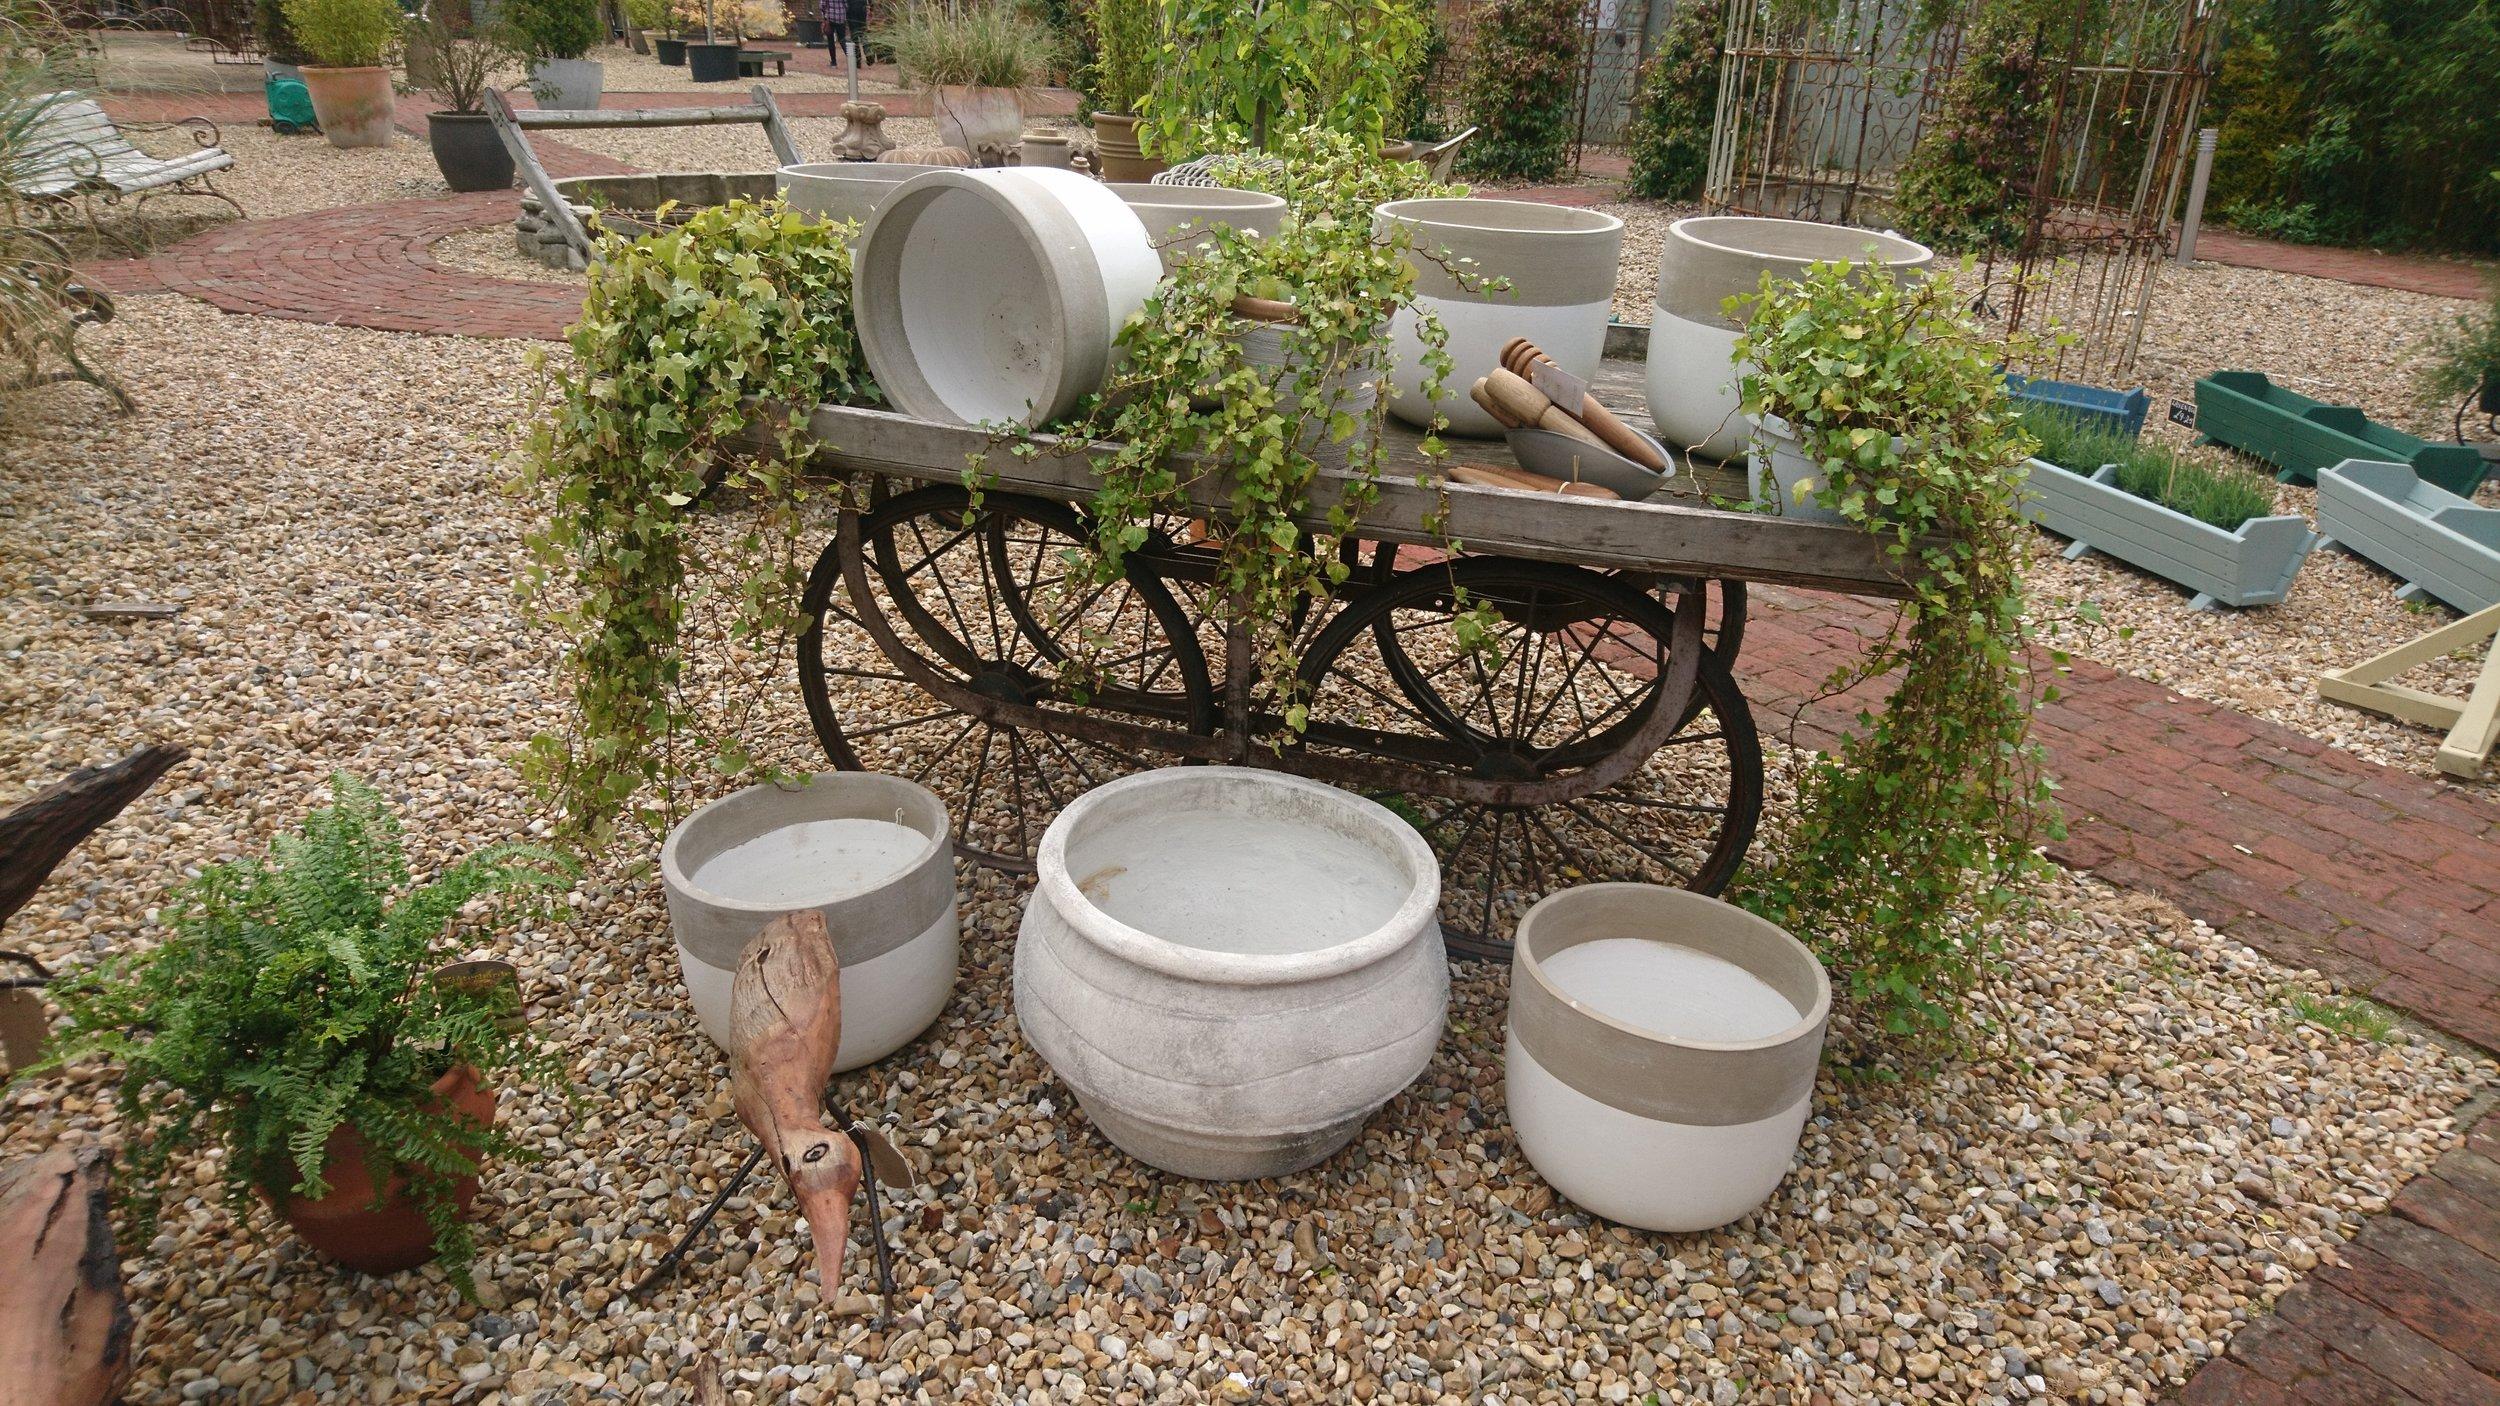 Unique garden finds in East Sussex